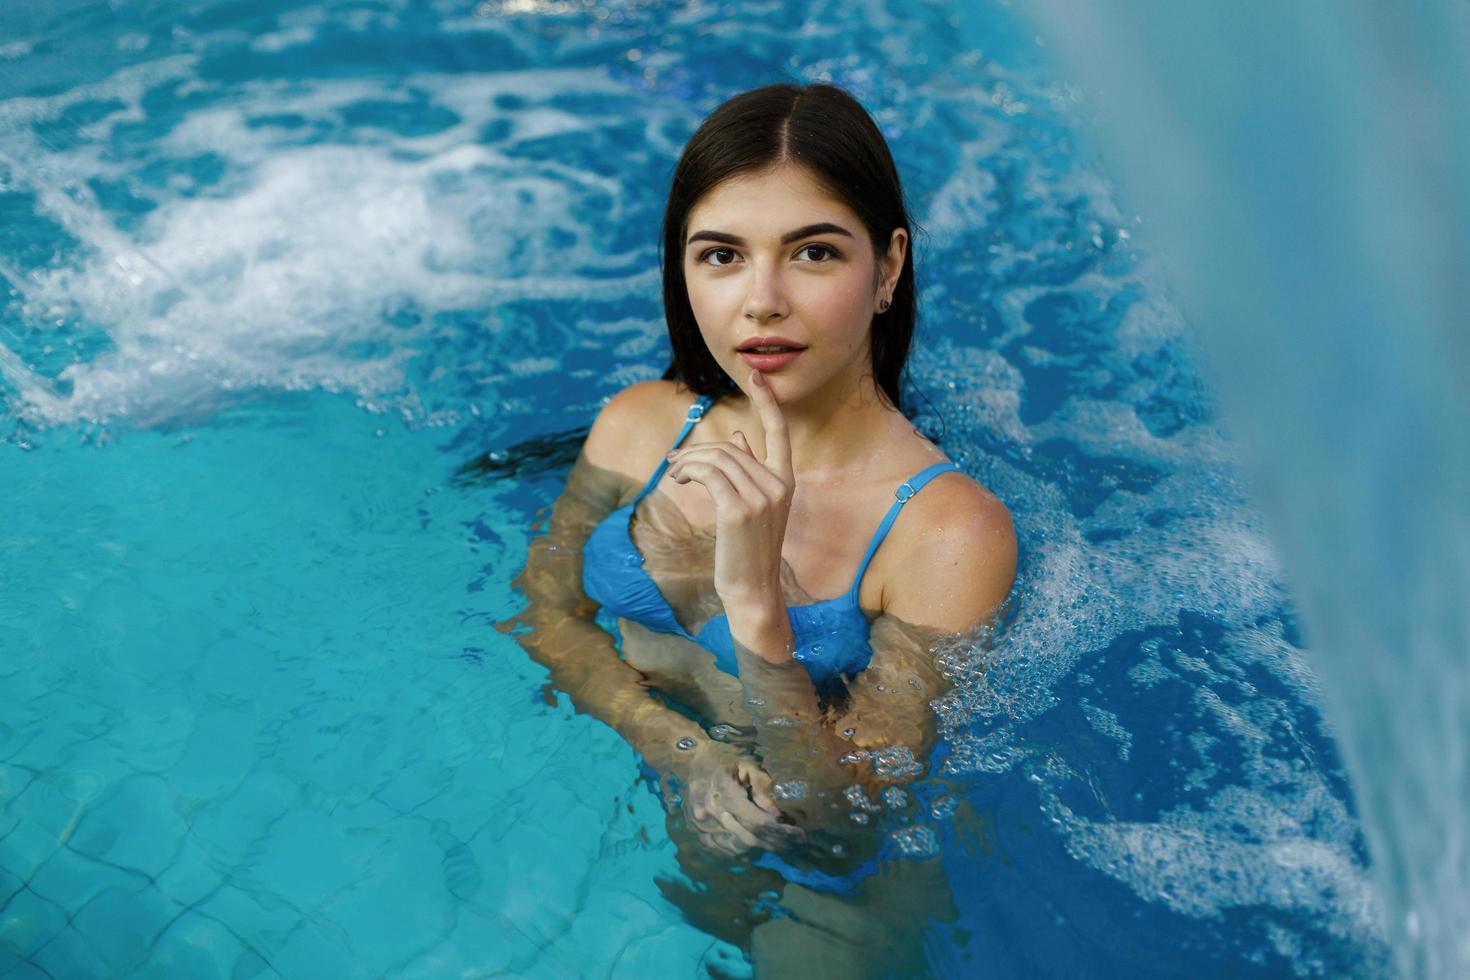 niña en una piscina foto